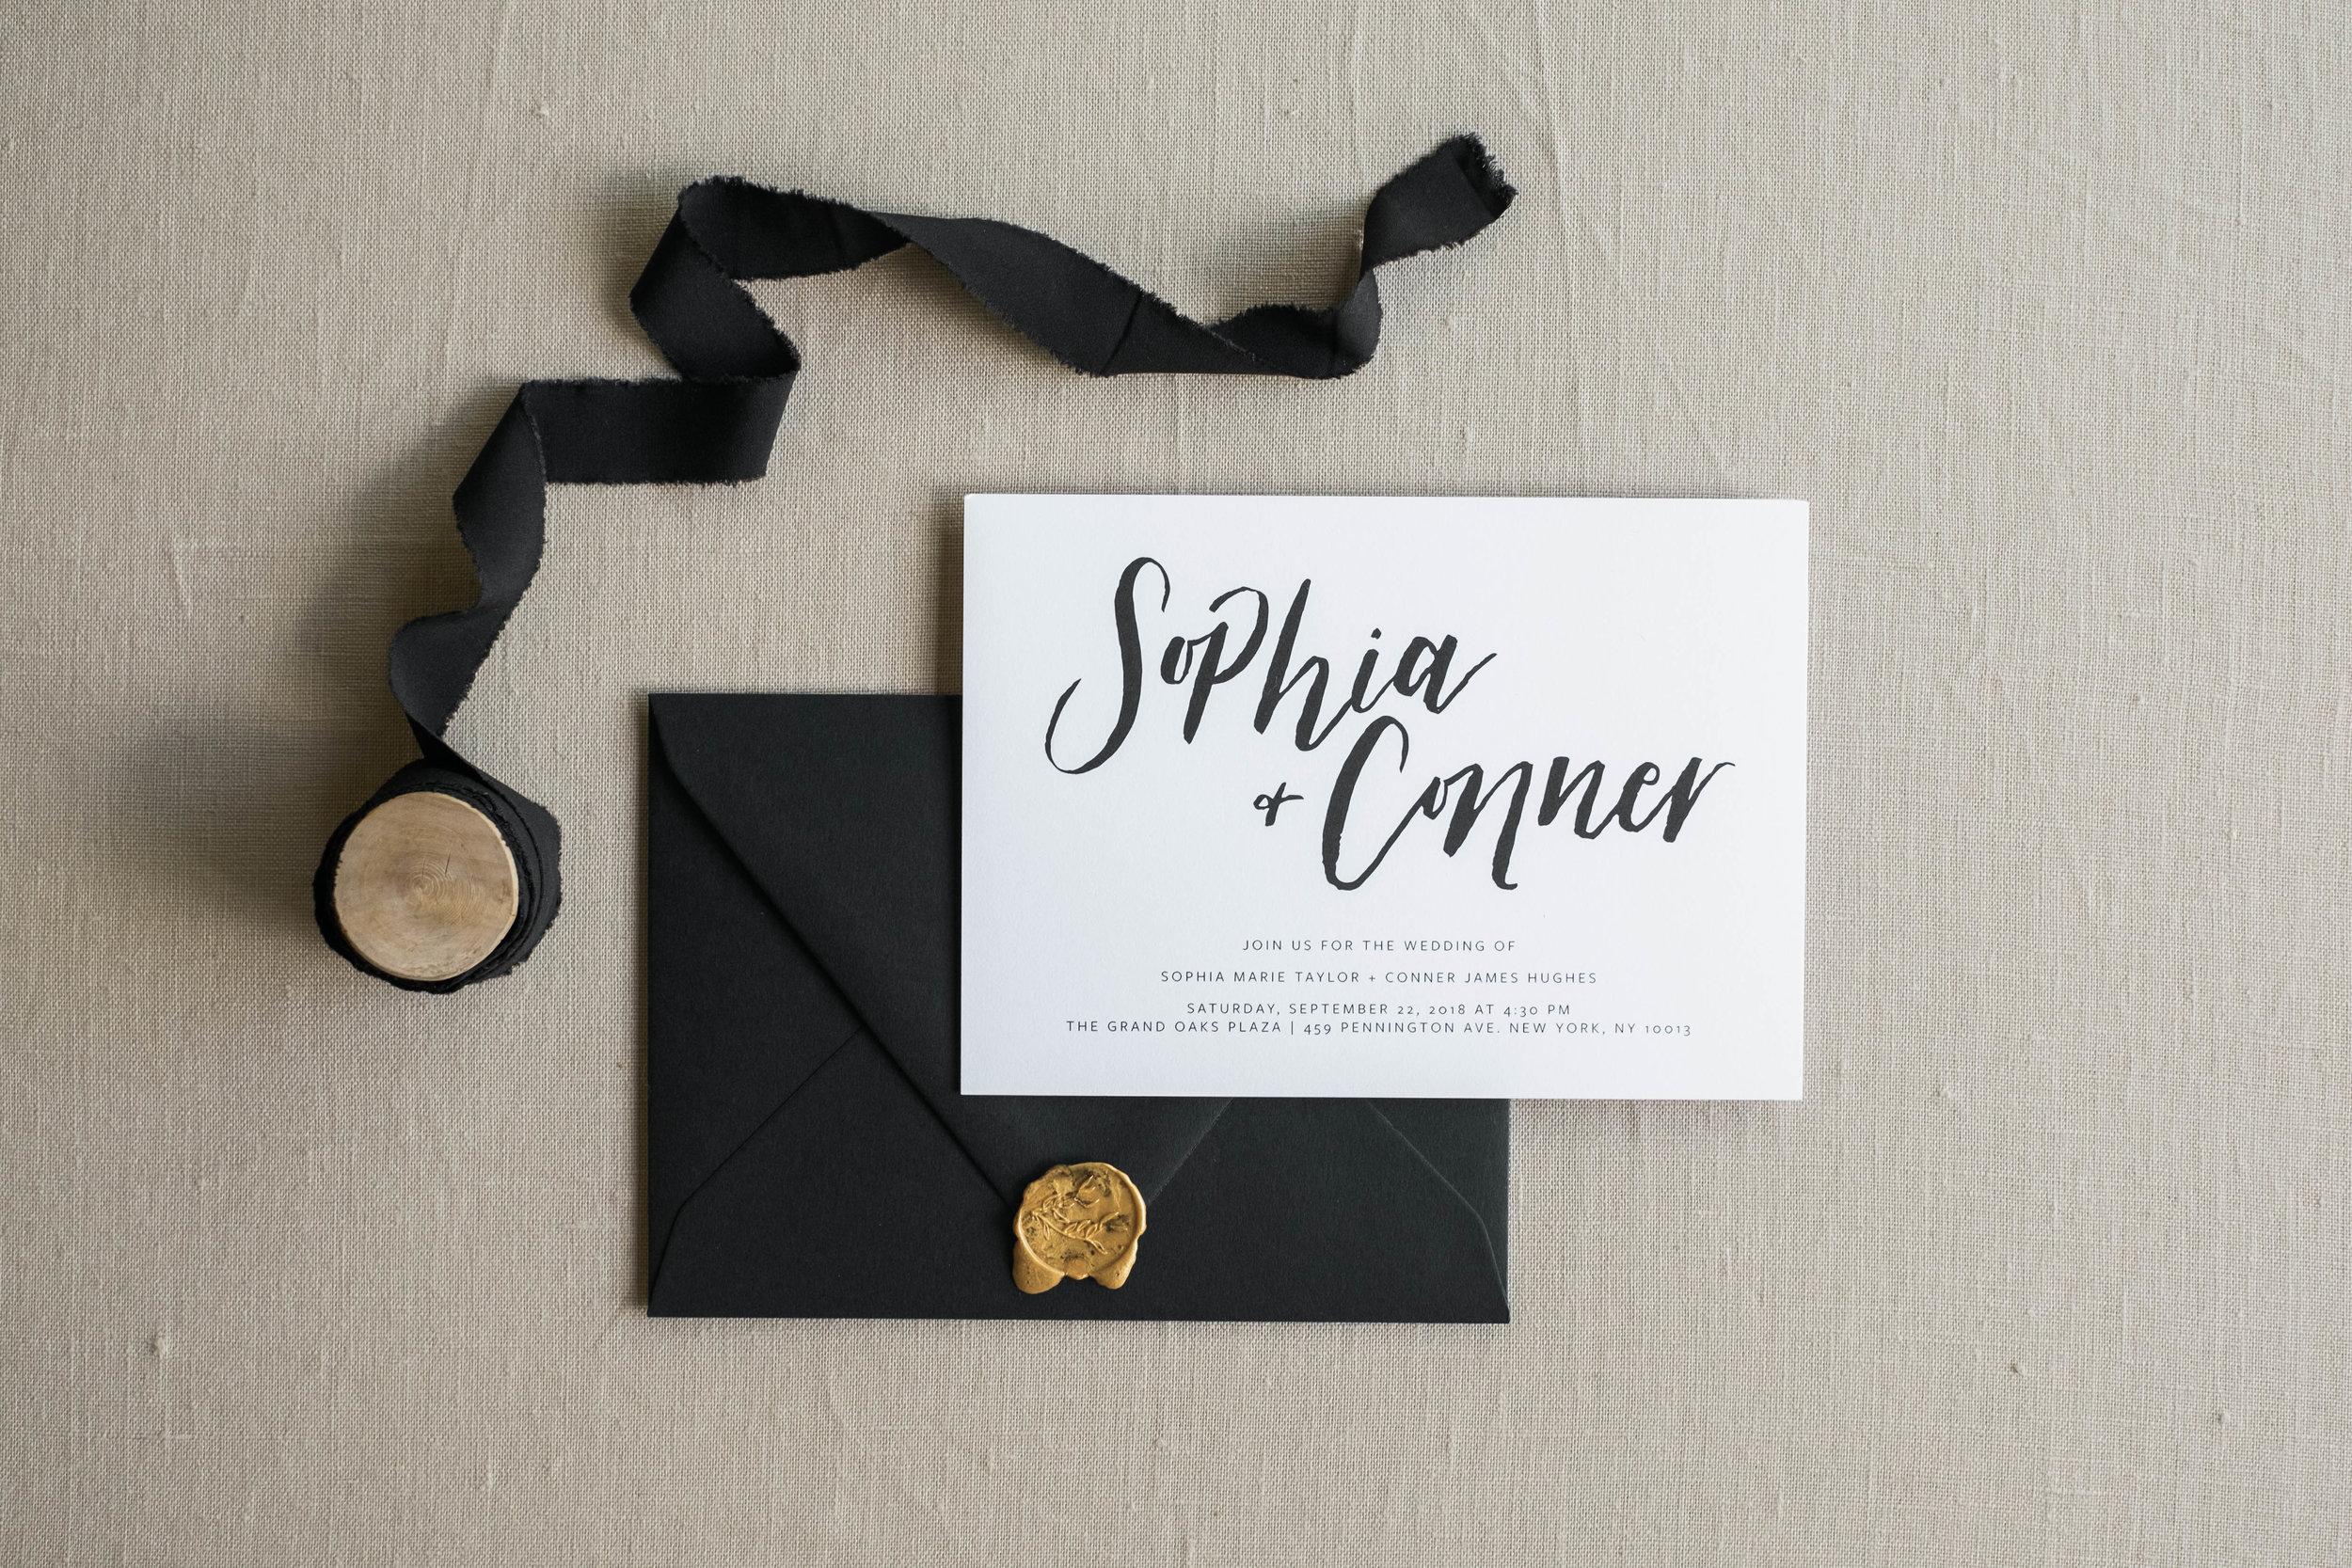 Main invitation